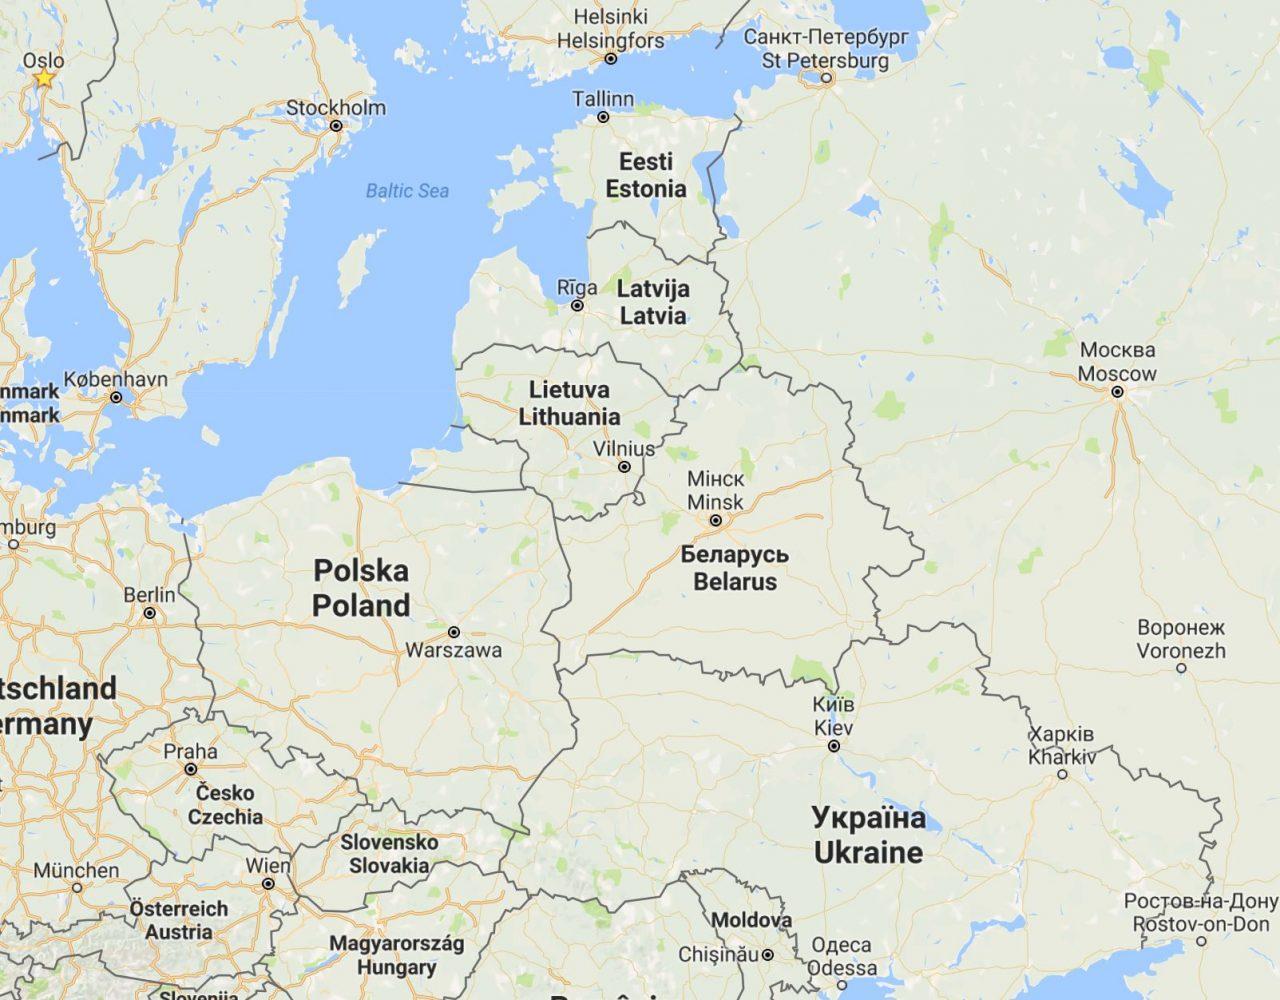 https://www.aldrimer.no/wp-content/uploads/2017/04/kart-hviterussland-1280x1000.jpg